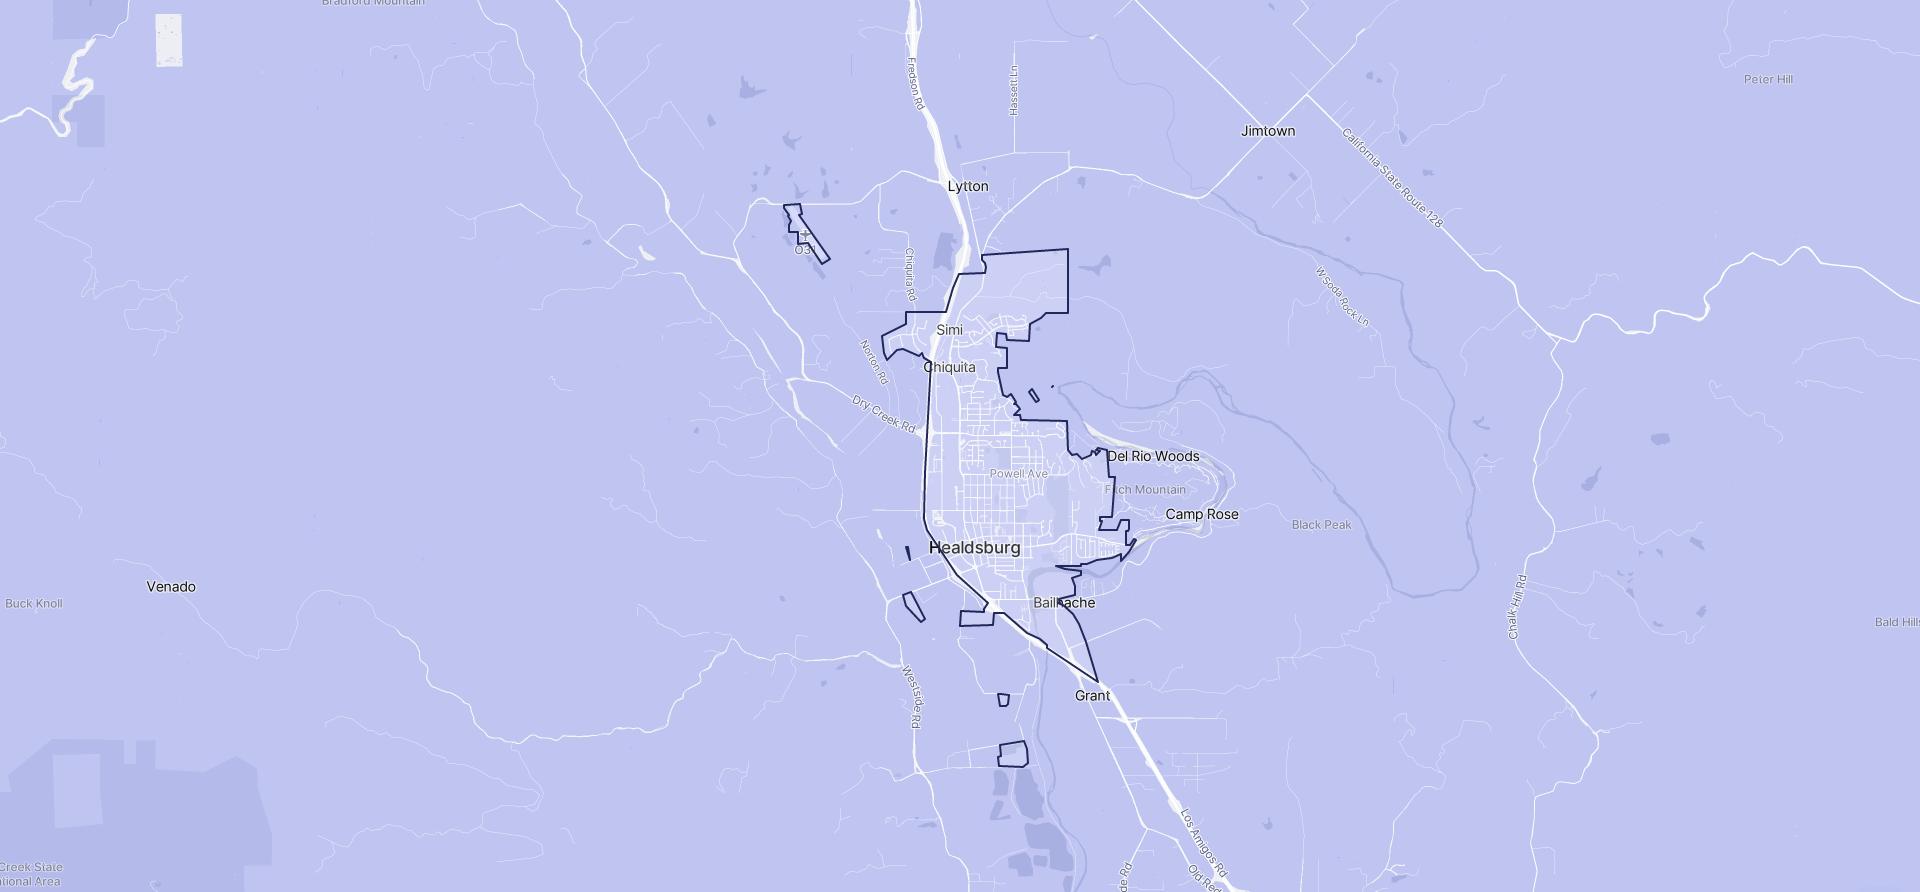 Image of Healdsburg boundaries on a map.